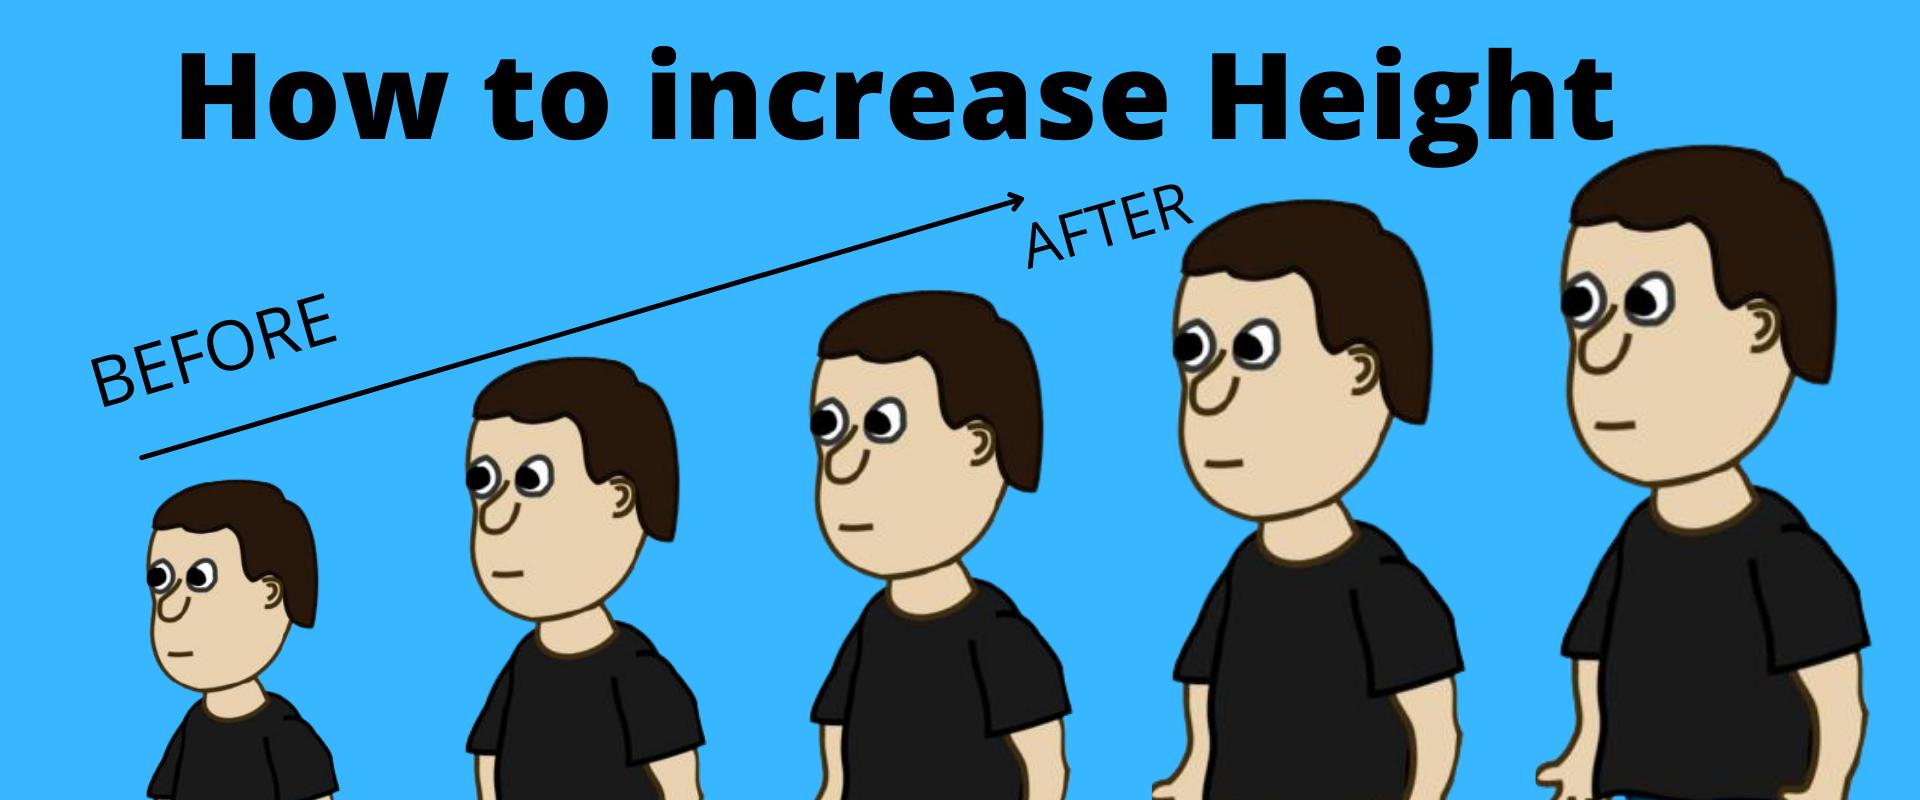 How to increase height in 1 week guaranteed